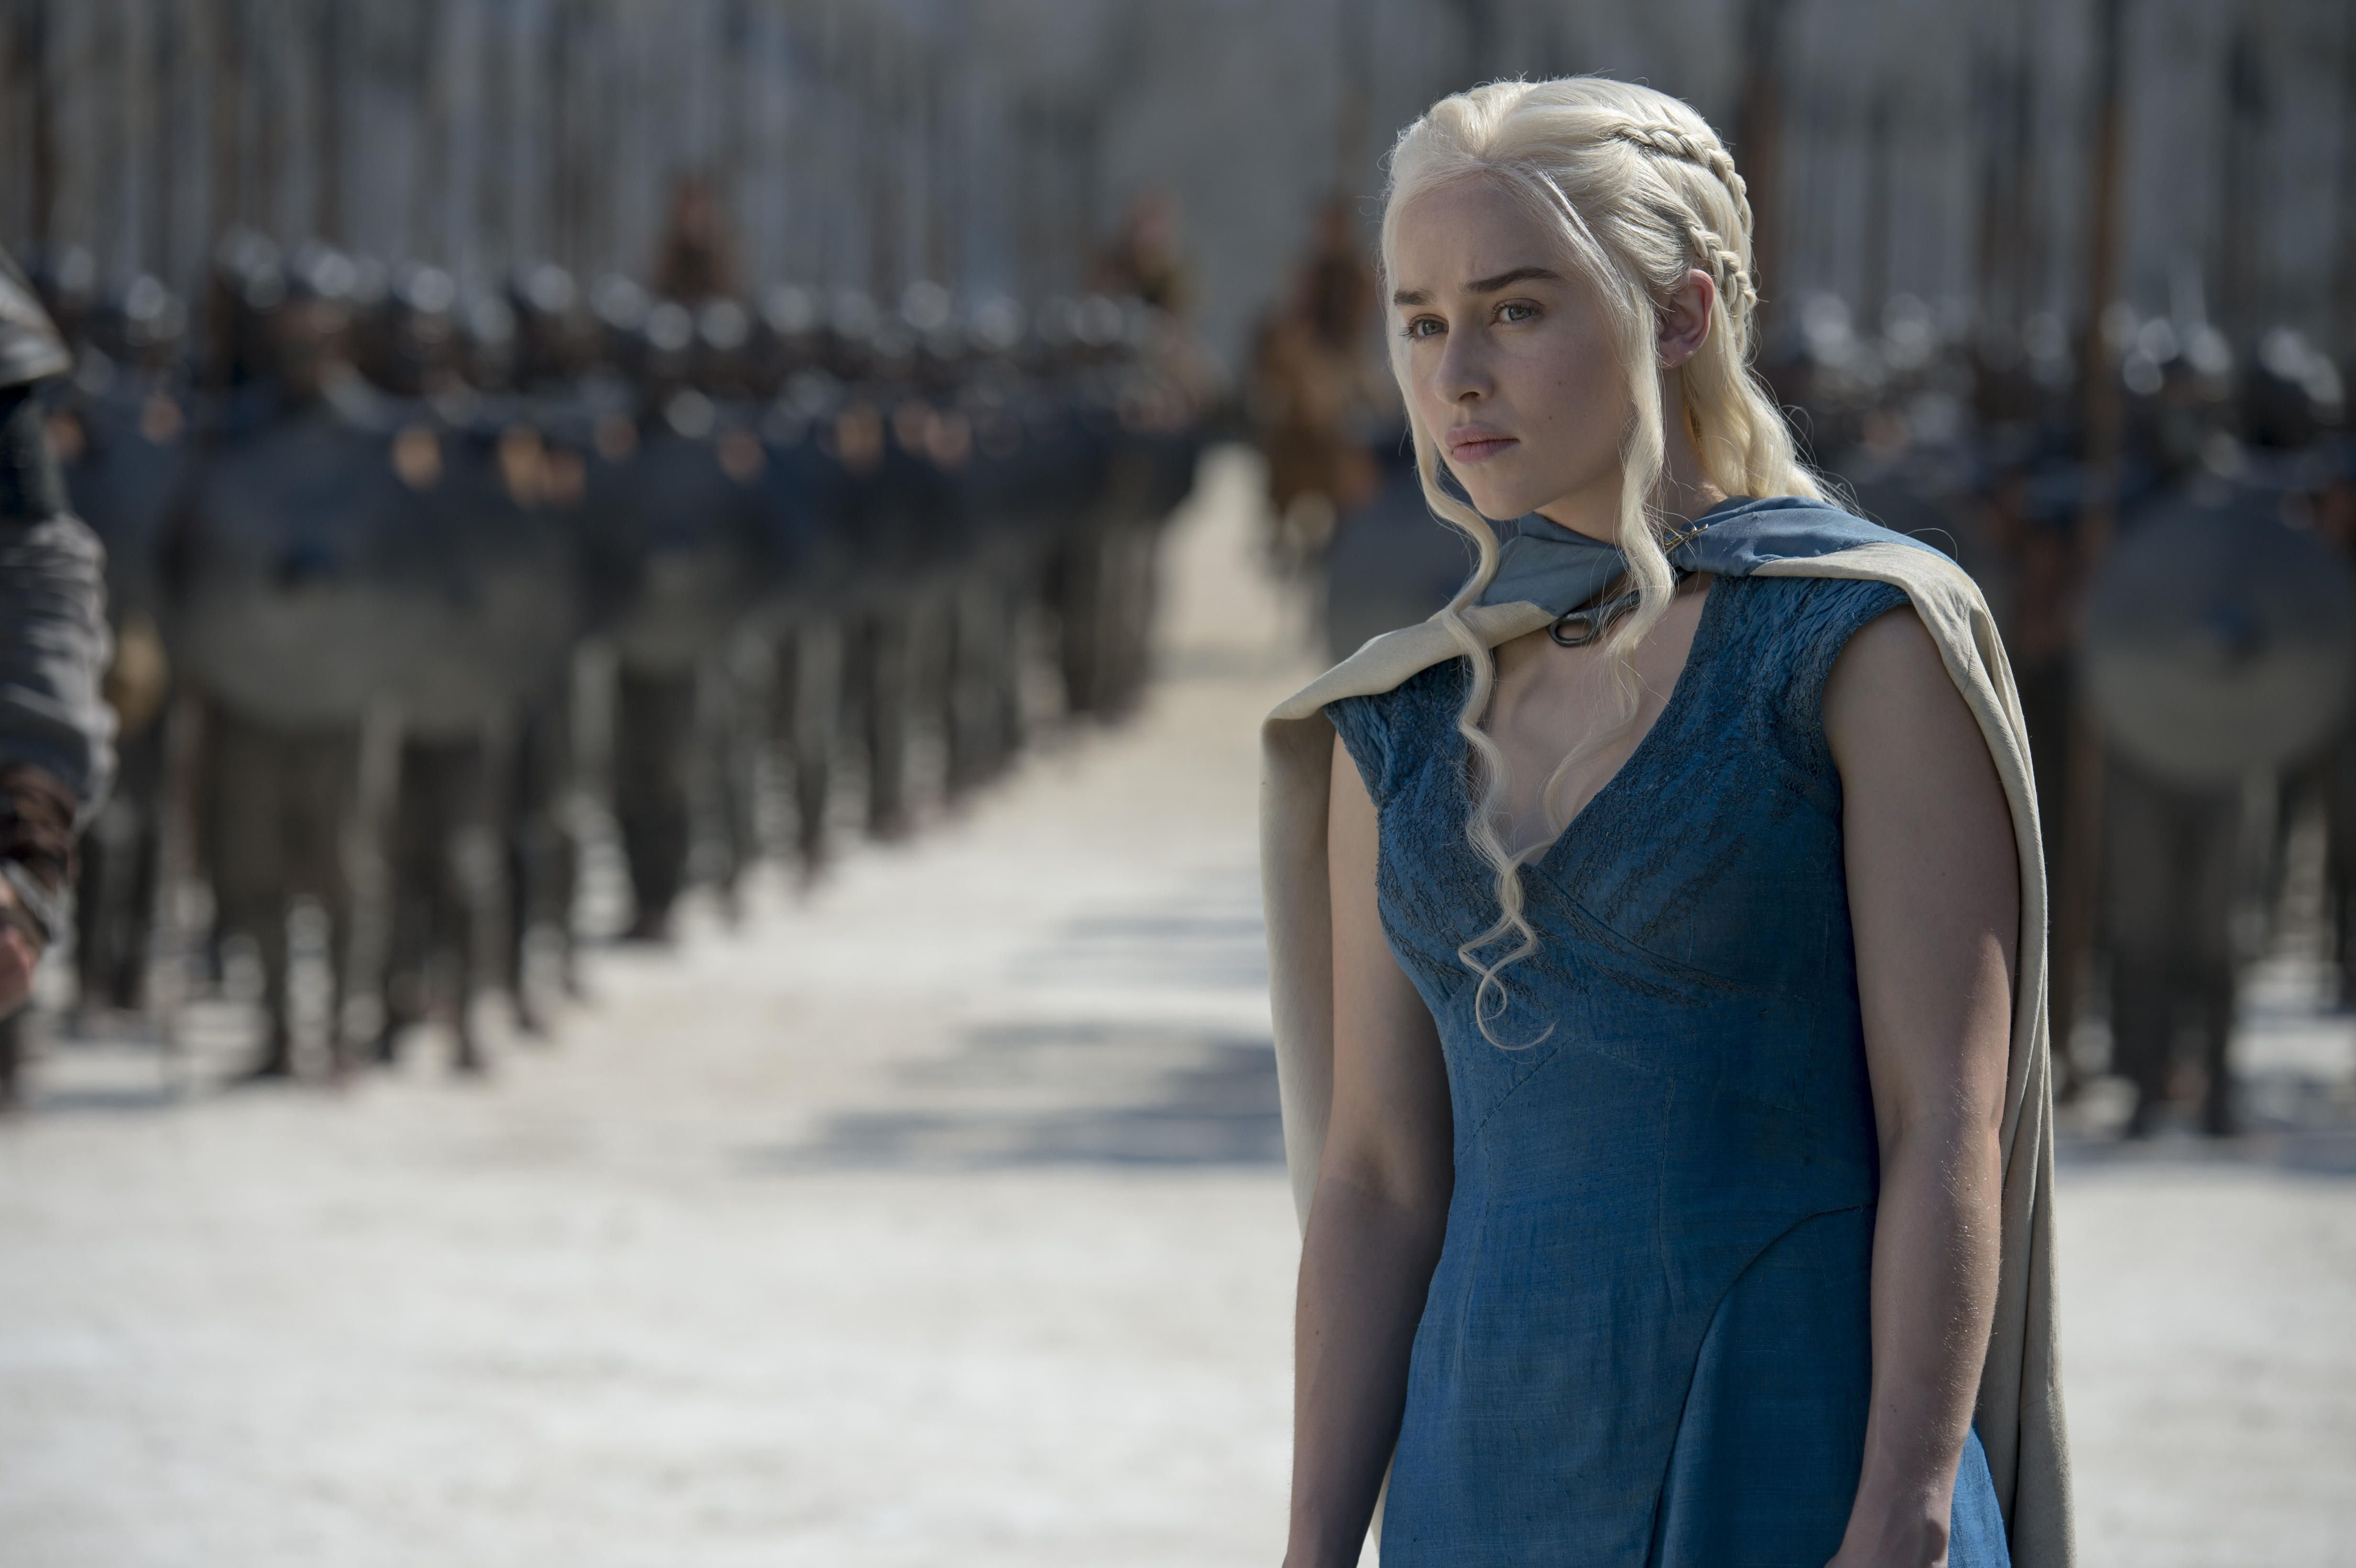 http://vignette4.wikia.nocookie.net/gossipgirl/images/2/23/Daenerys-Targaryen-Season-4-daenerys-targaryen-36978110-4928-3280.jpg/revision/latest?cb=20140501005802